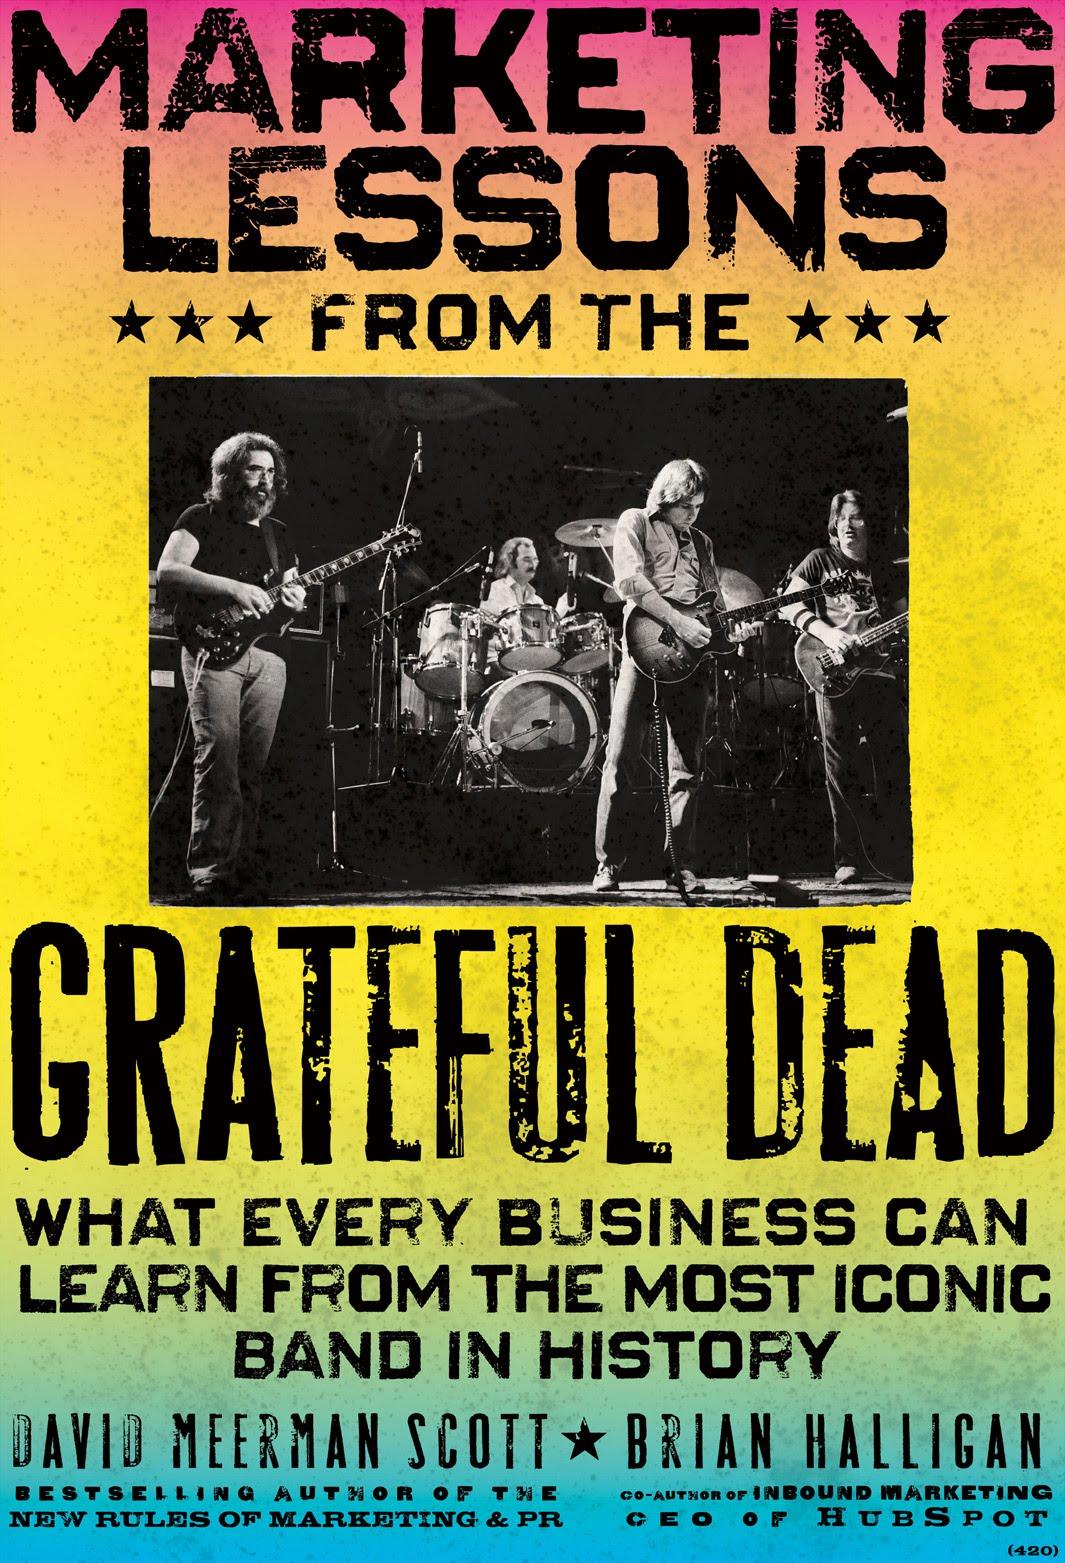 GratefulDead.jpg